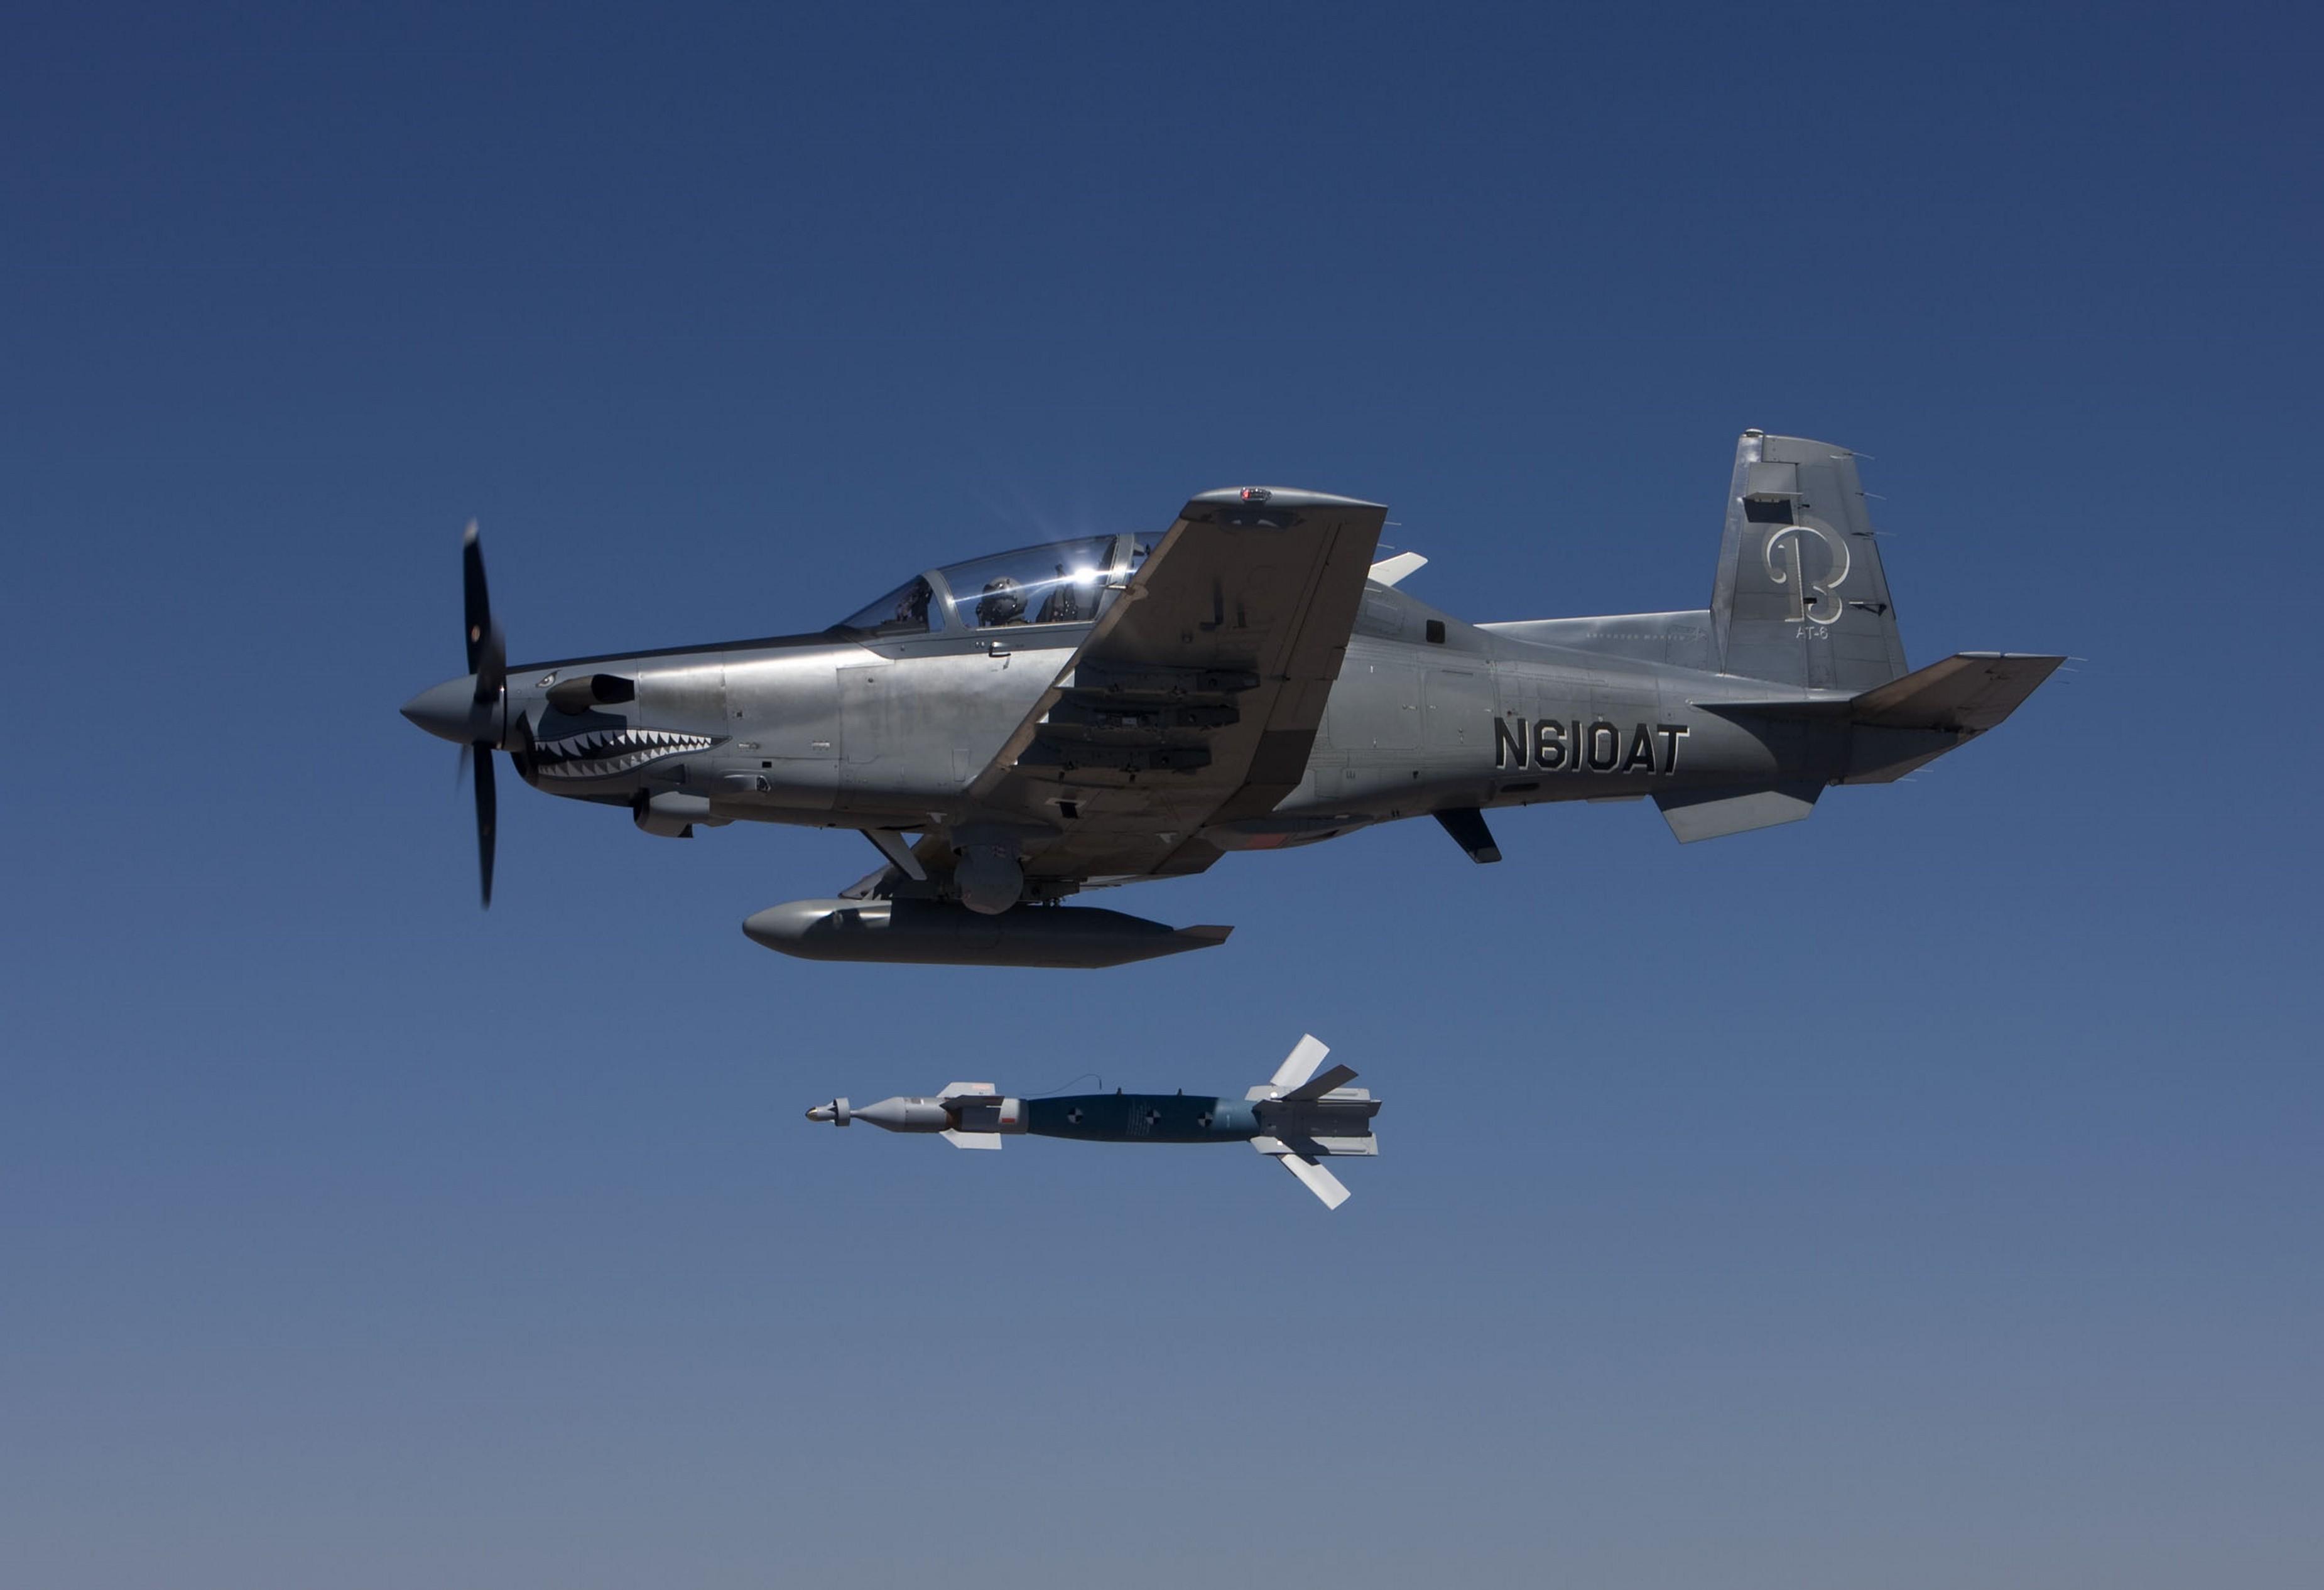 drone laws with Beechcraft At 6 Light Attack Aircraft Usa Army Fighter 7876 on Beechcraft At 6 Light Attack Aircraft Usa Army Fighter 7876 besides Watch also Ahvaz Khuzestan Iran 2 besides Vevey Suisse additionally Chikyu Capemuroranhokkaidojapan 2.